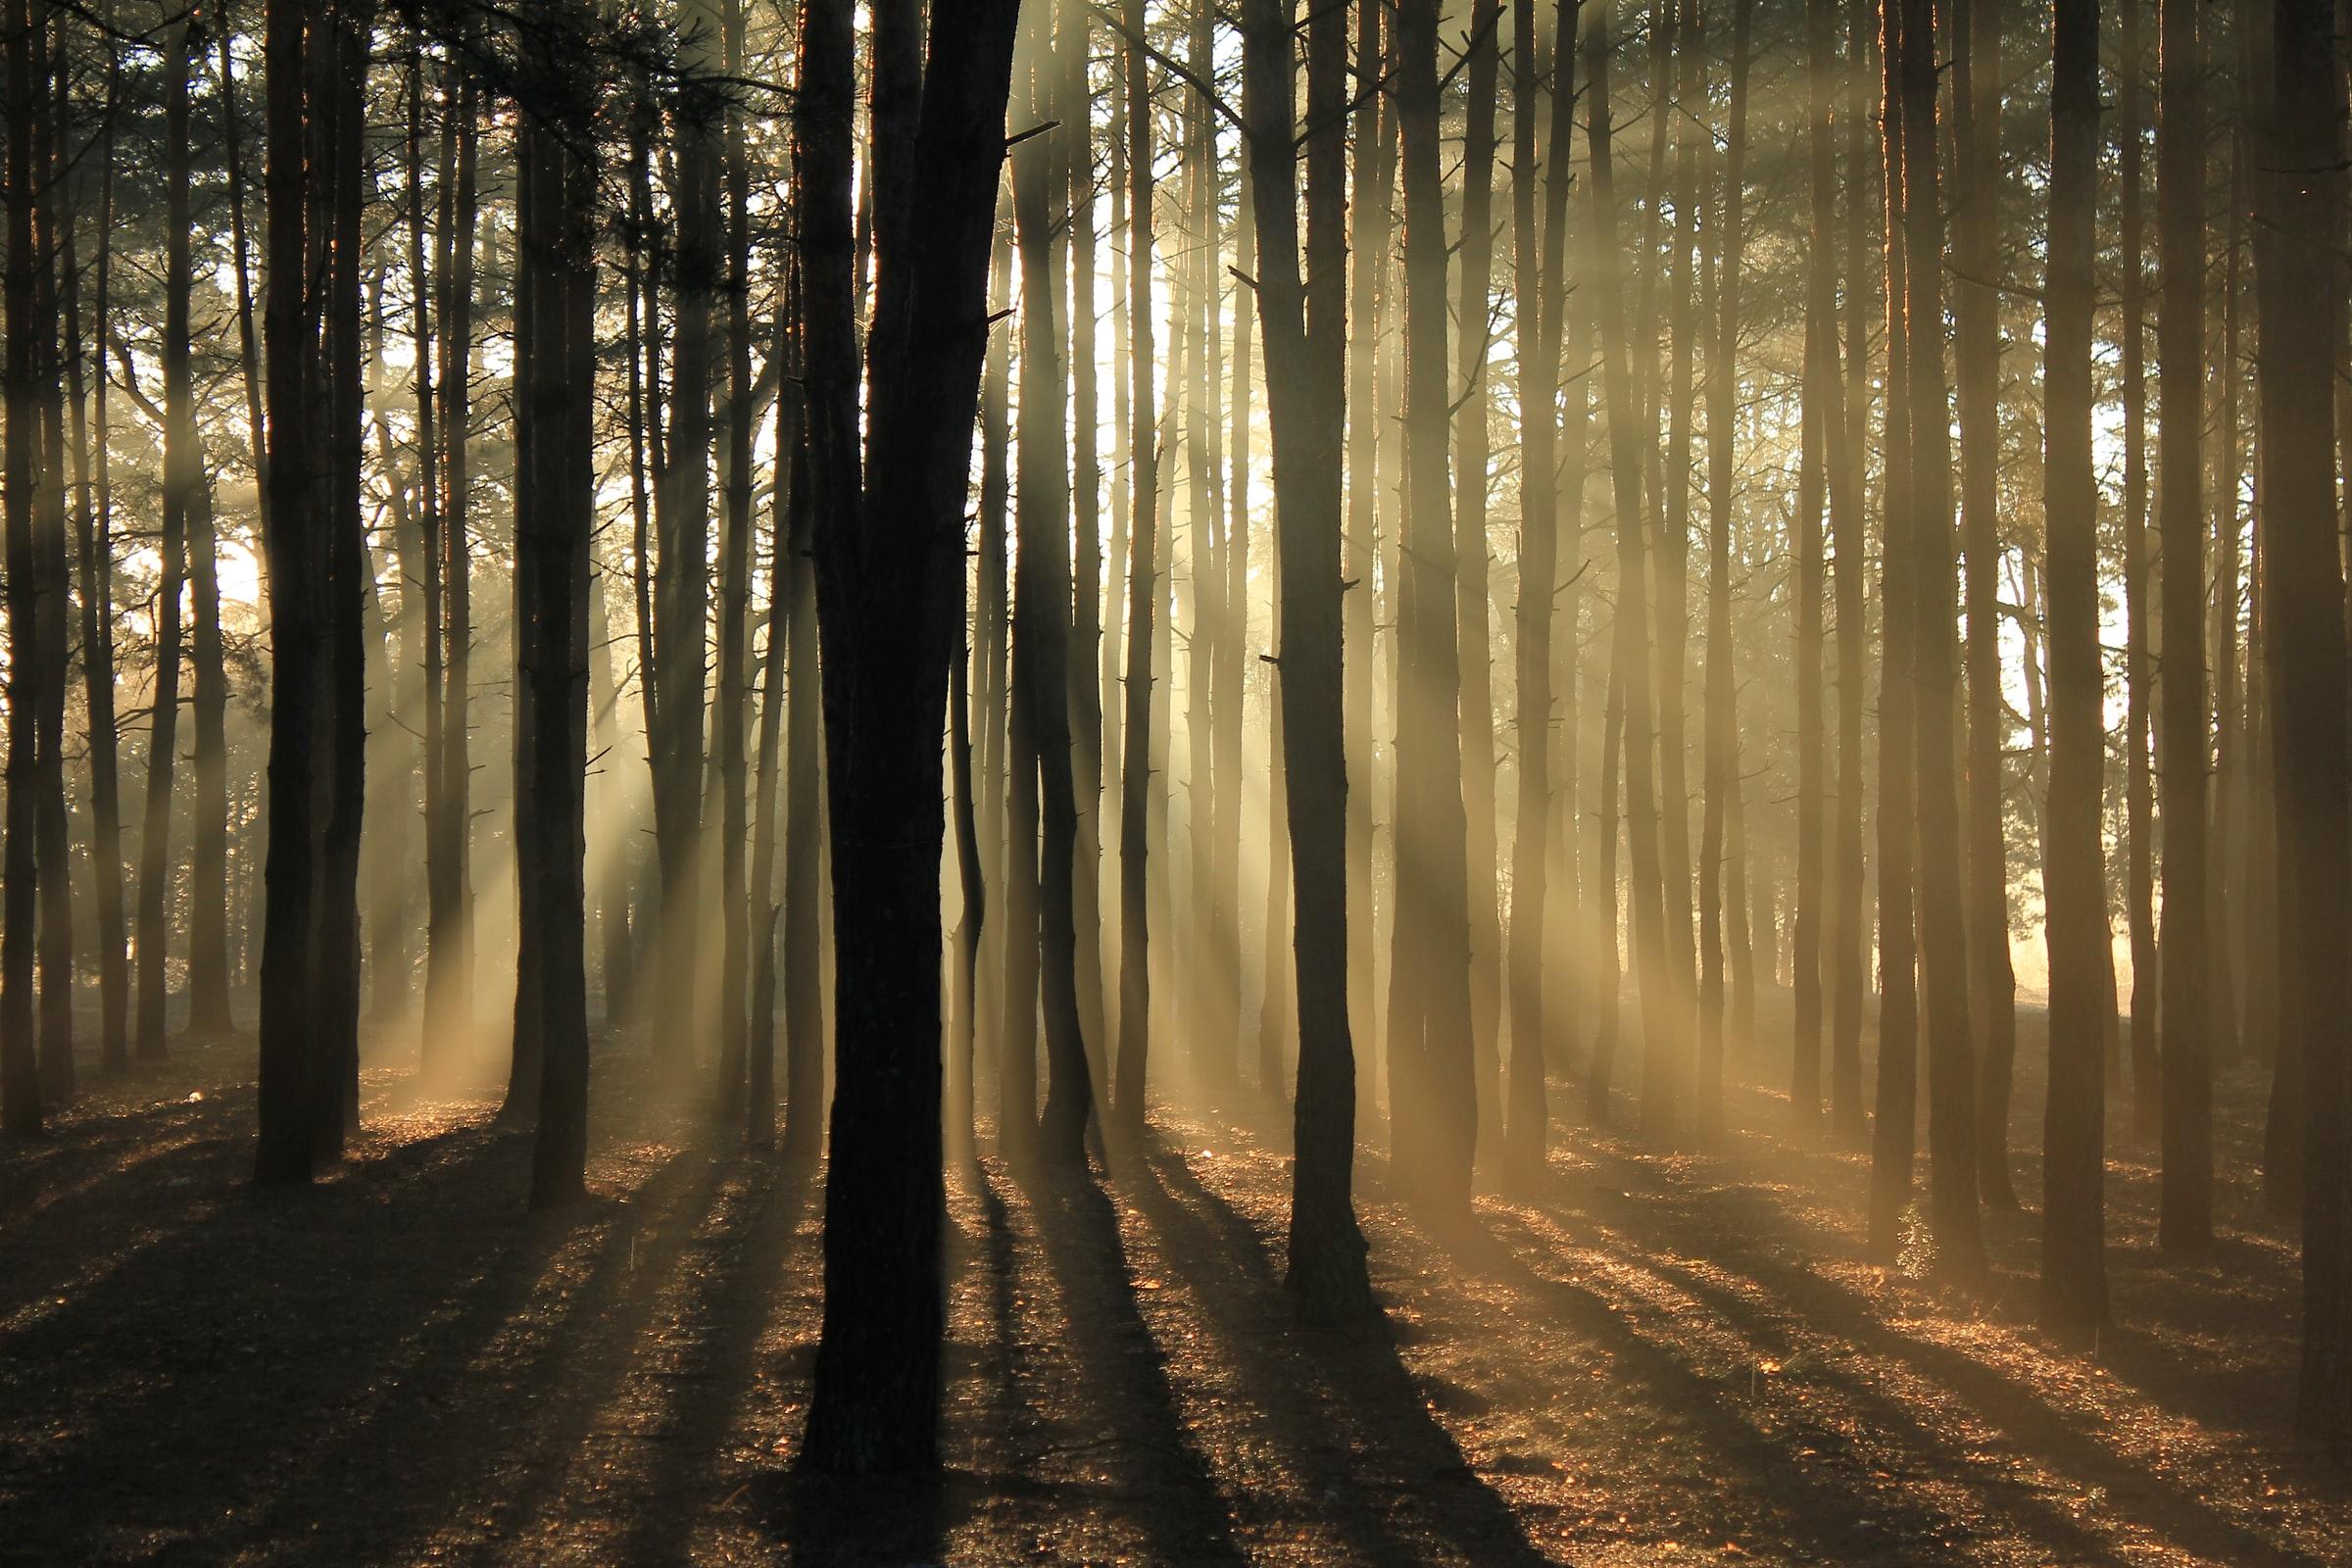 sunlight throuigh forest